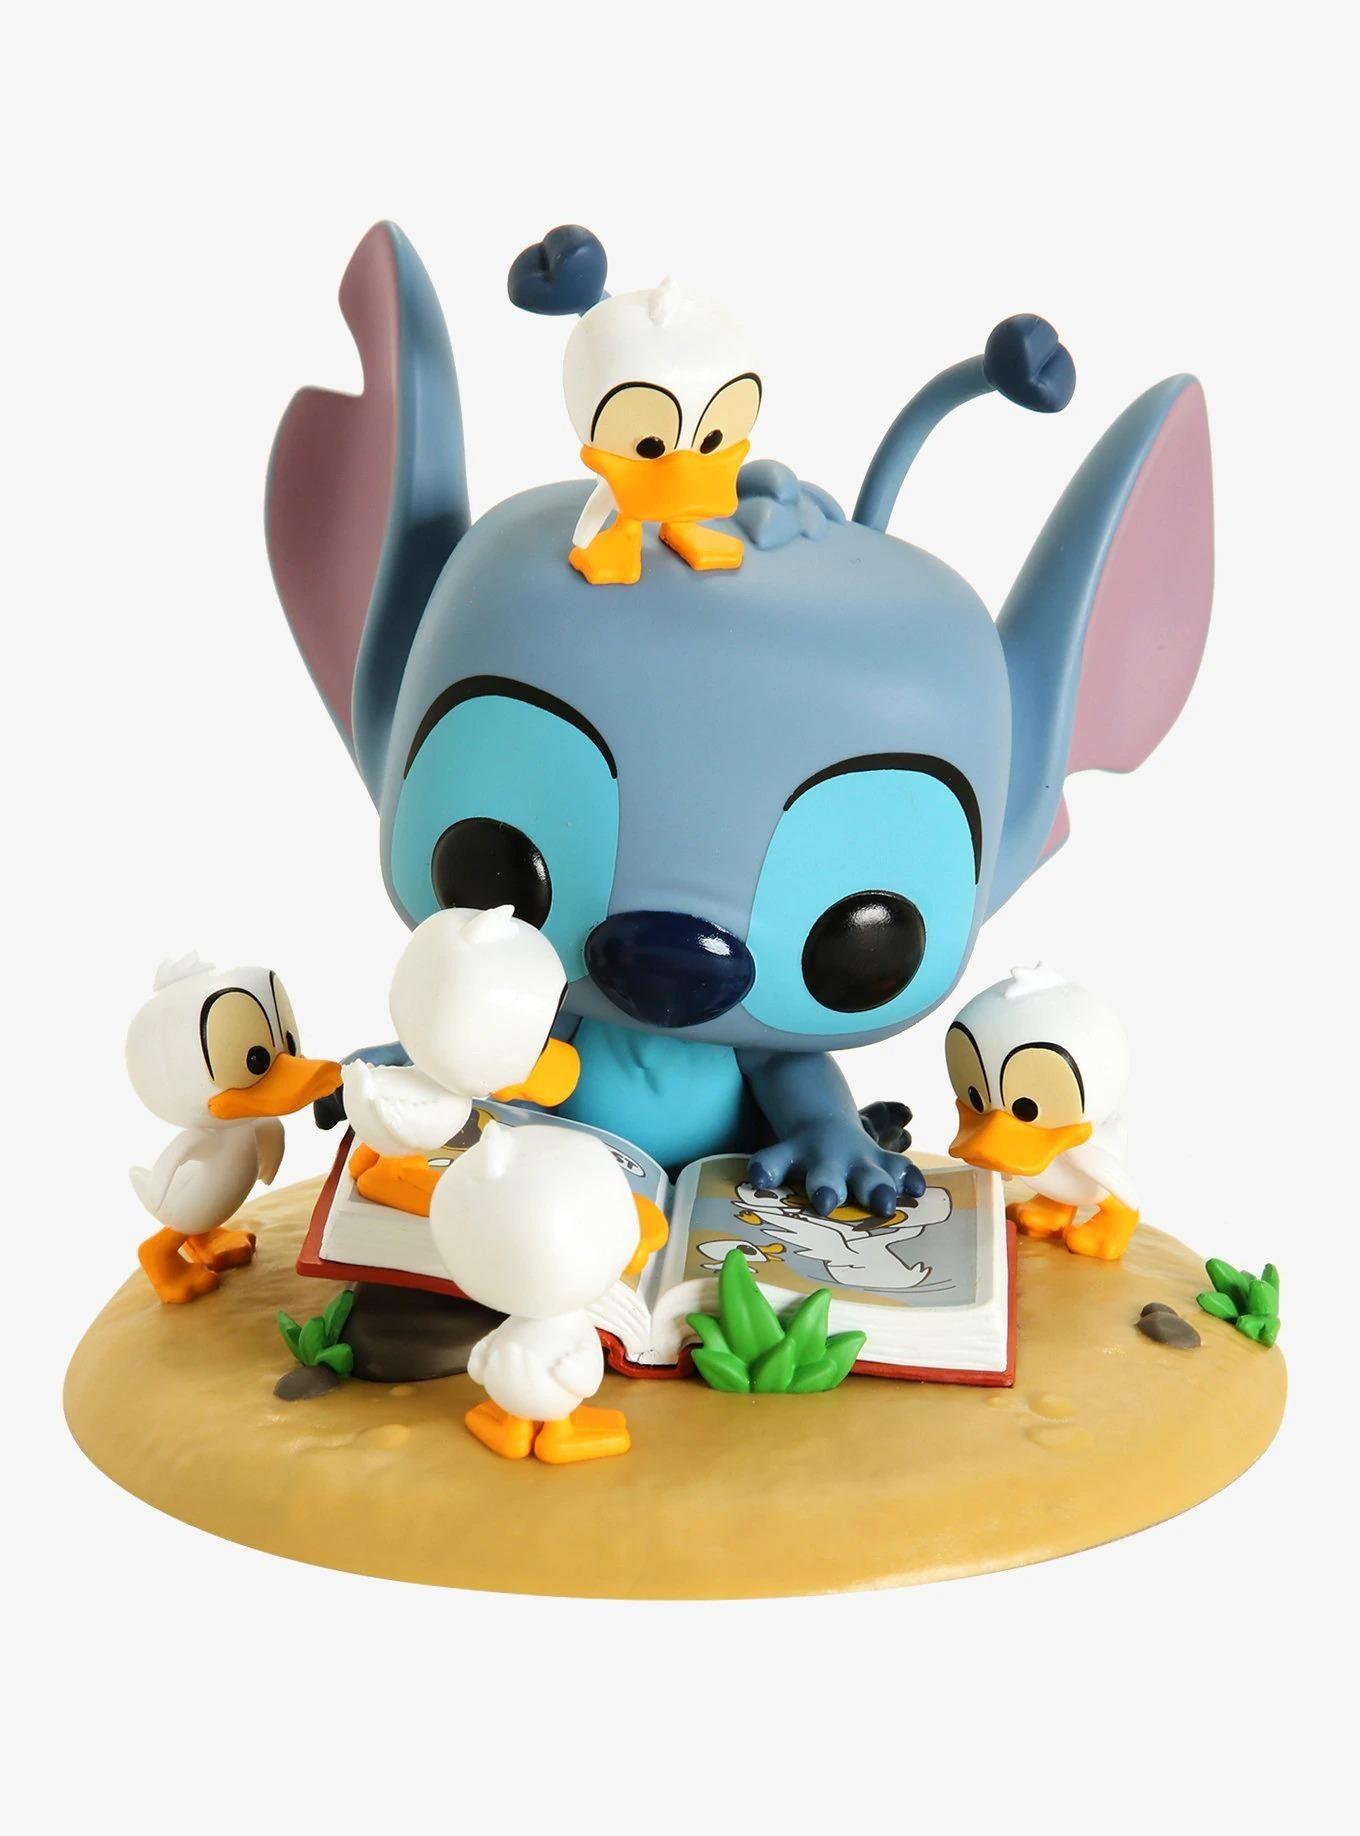 Funko Pop! Disney Lilo & Stitch Stitch with Ducks Vinyl Figure - BoxLunch Exclusive